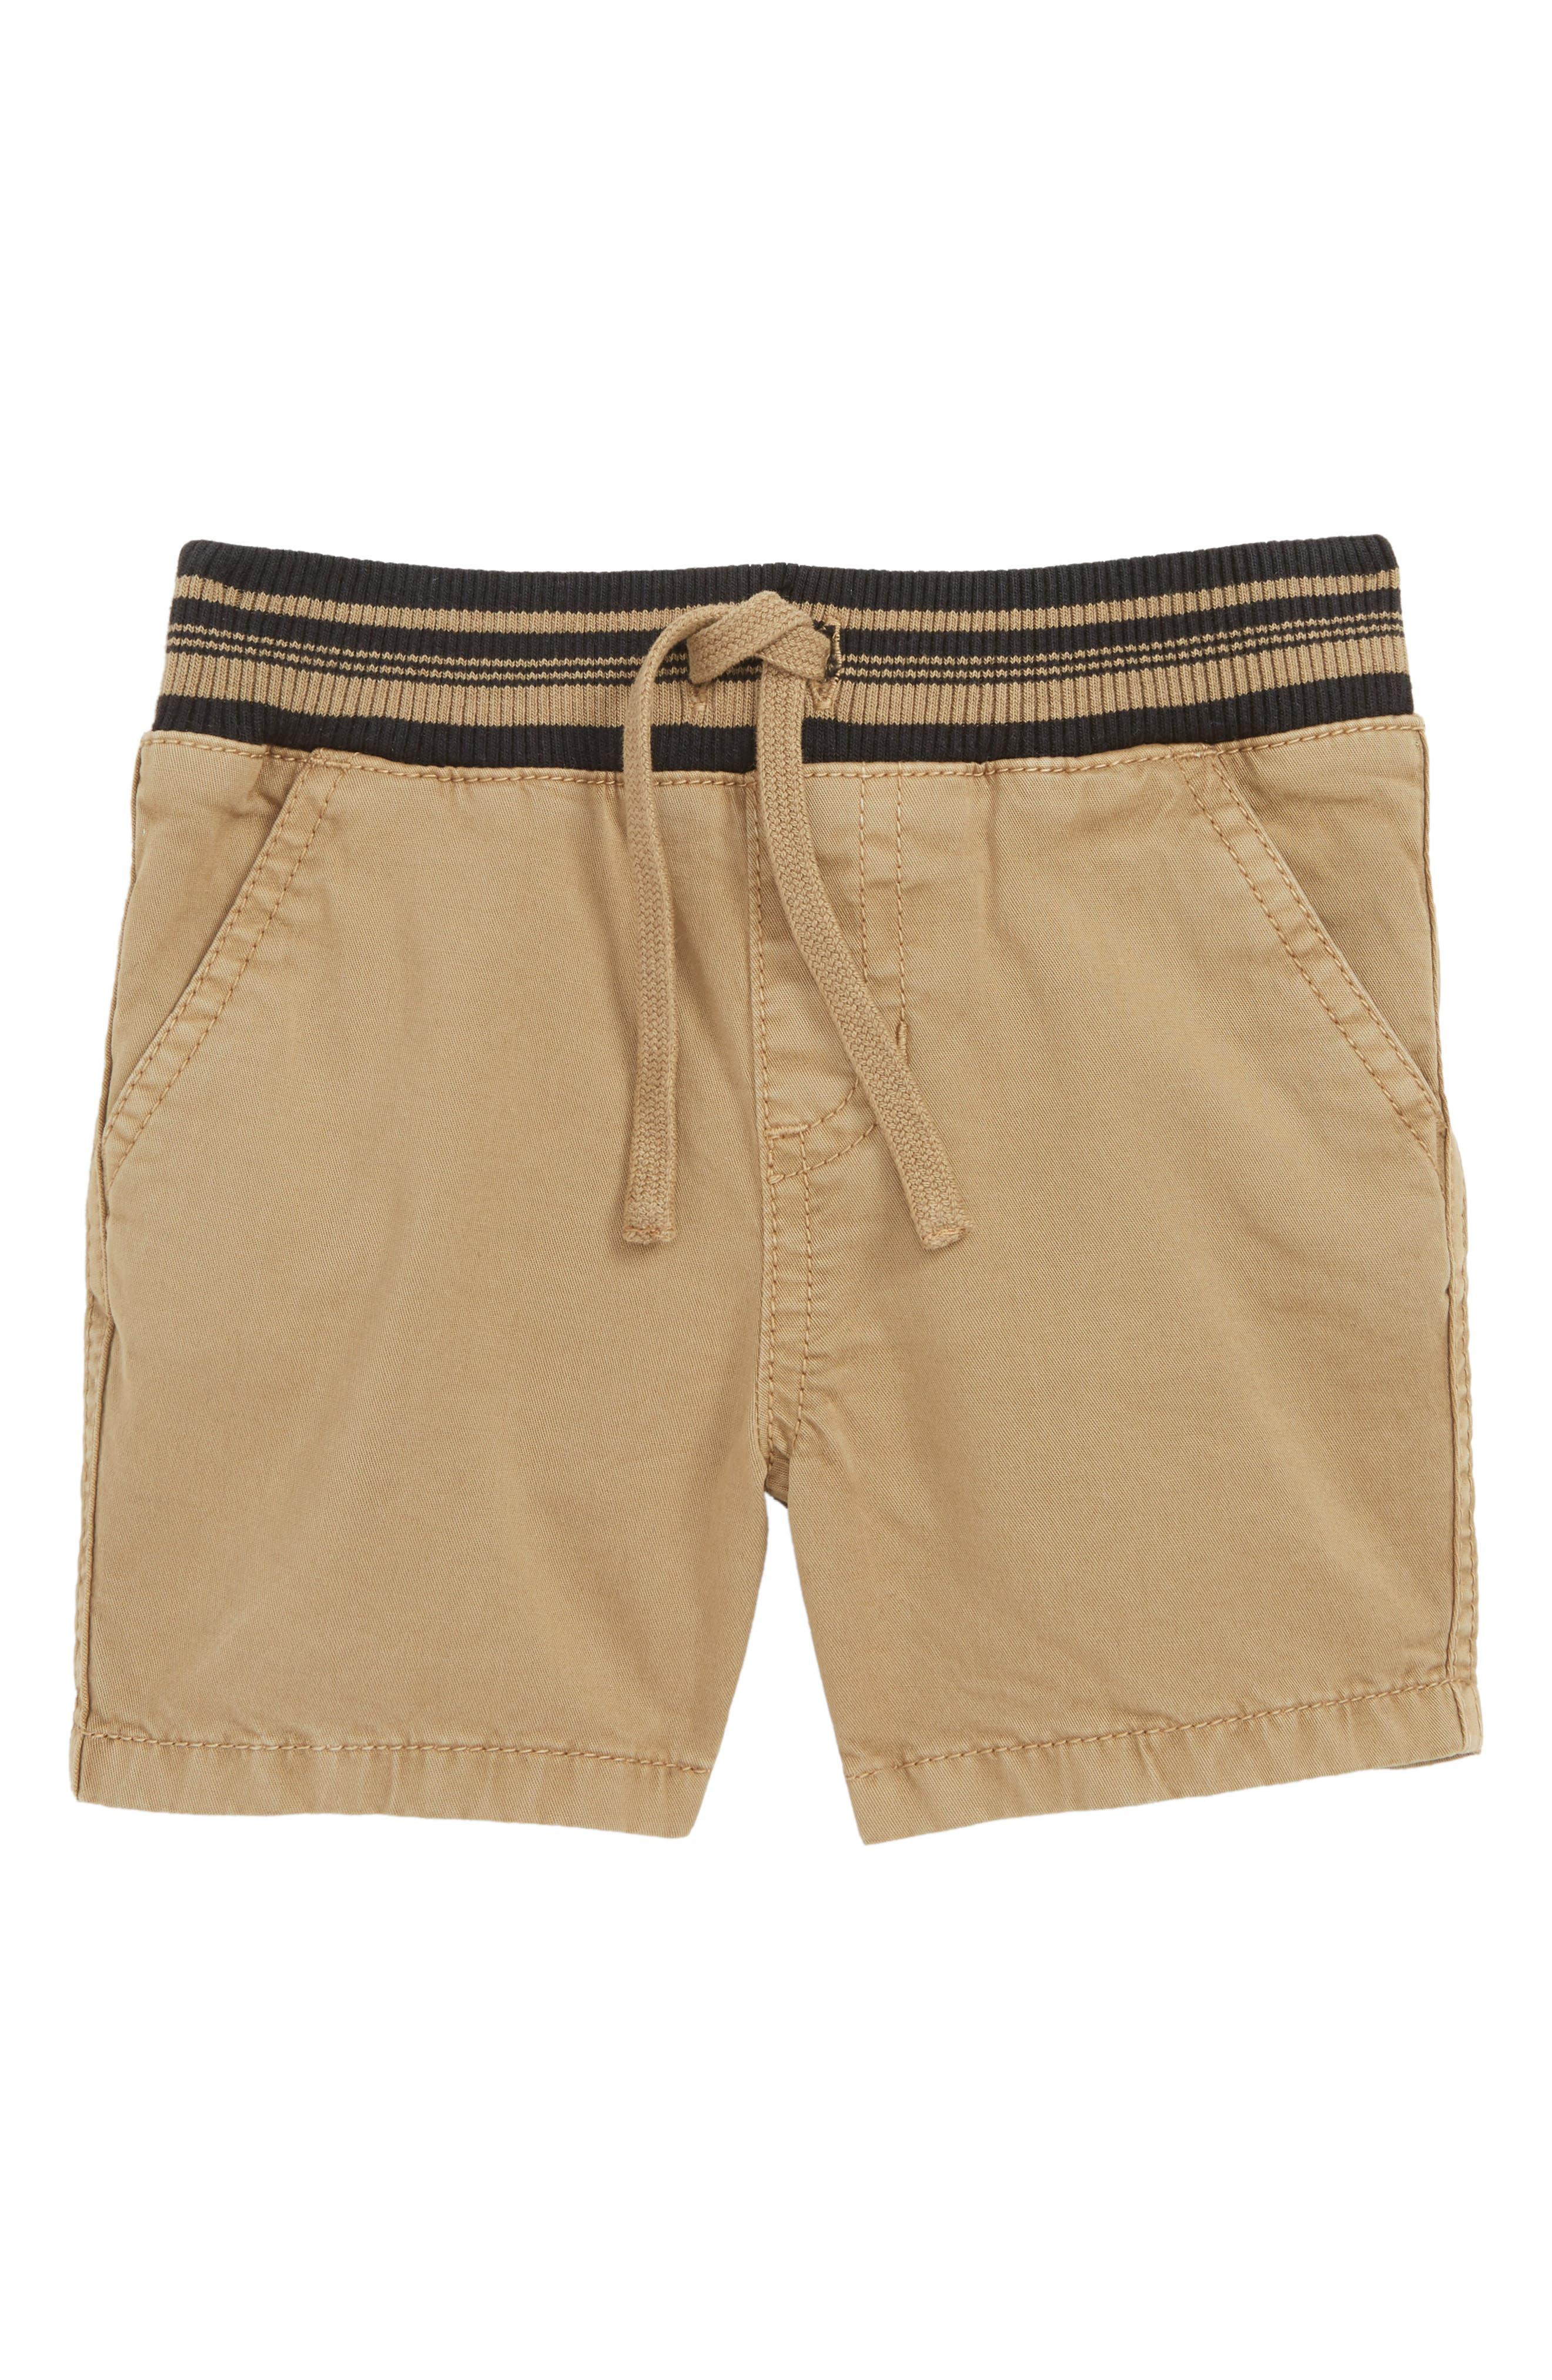 Prime Time Unwind Time Shorts, Main, color, TAN LEAD